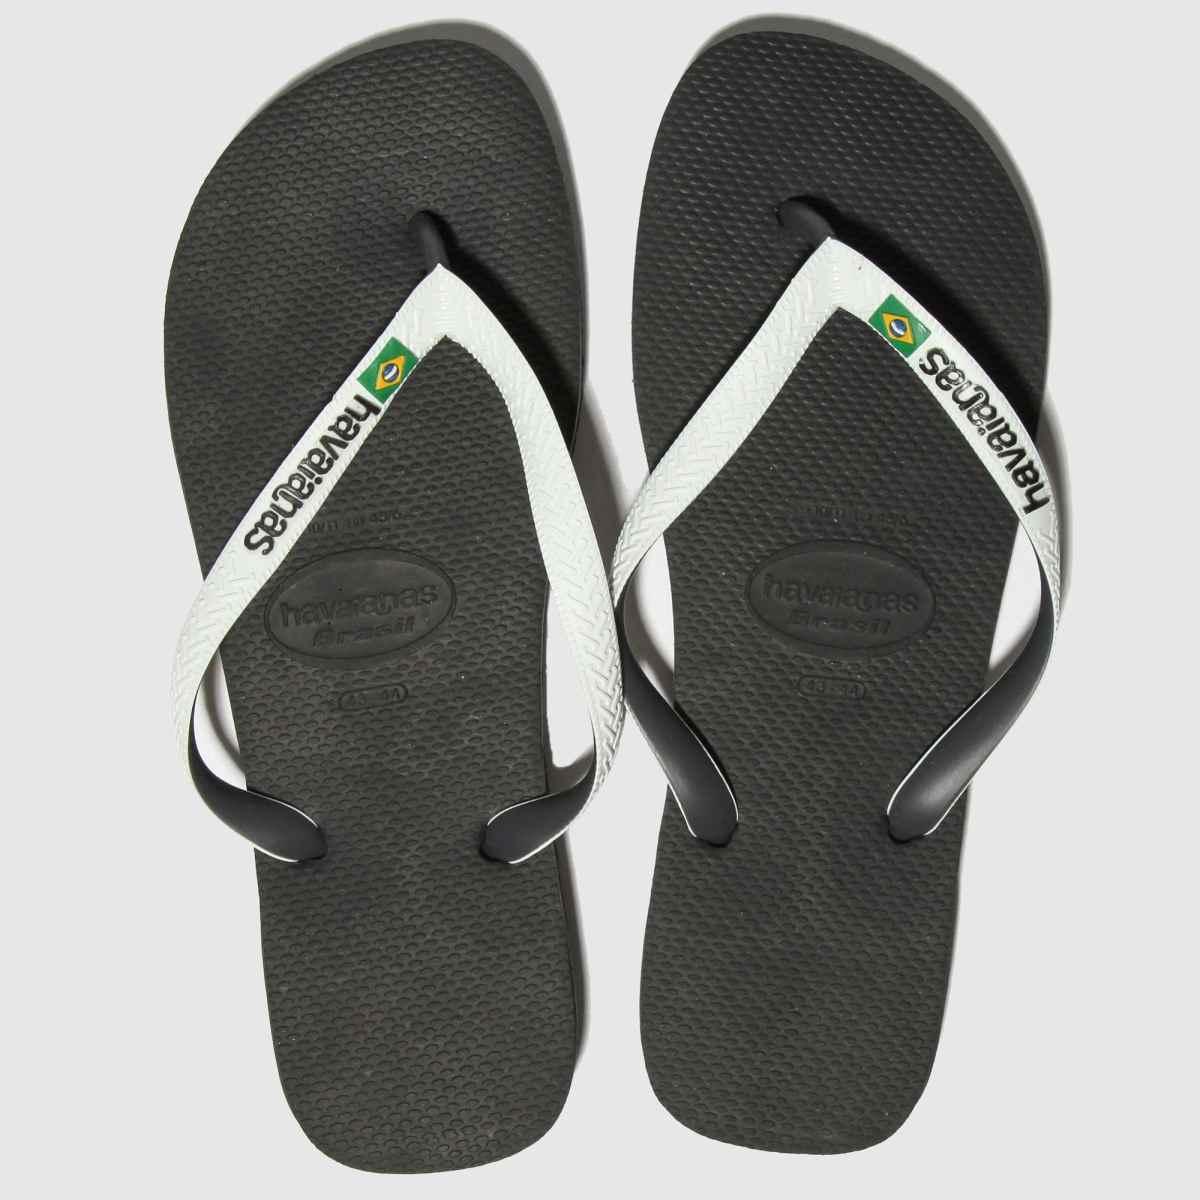 Havaianas Black & White Brasil Mix Sandals